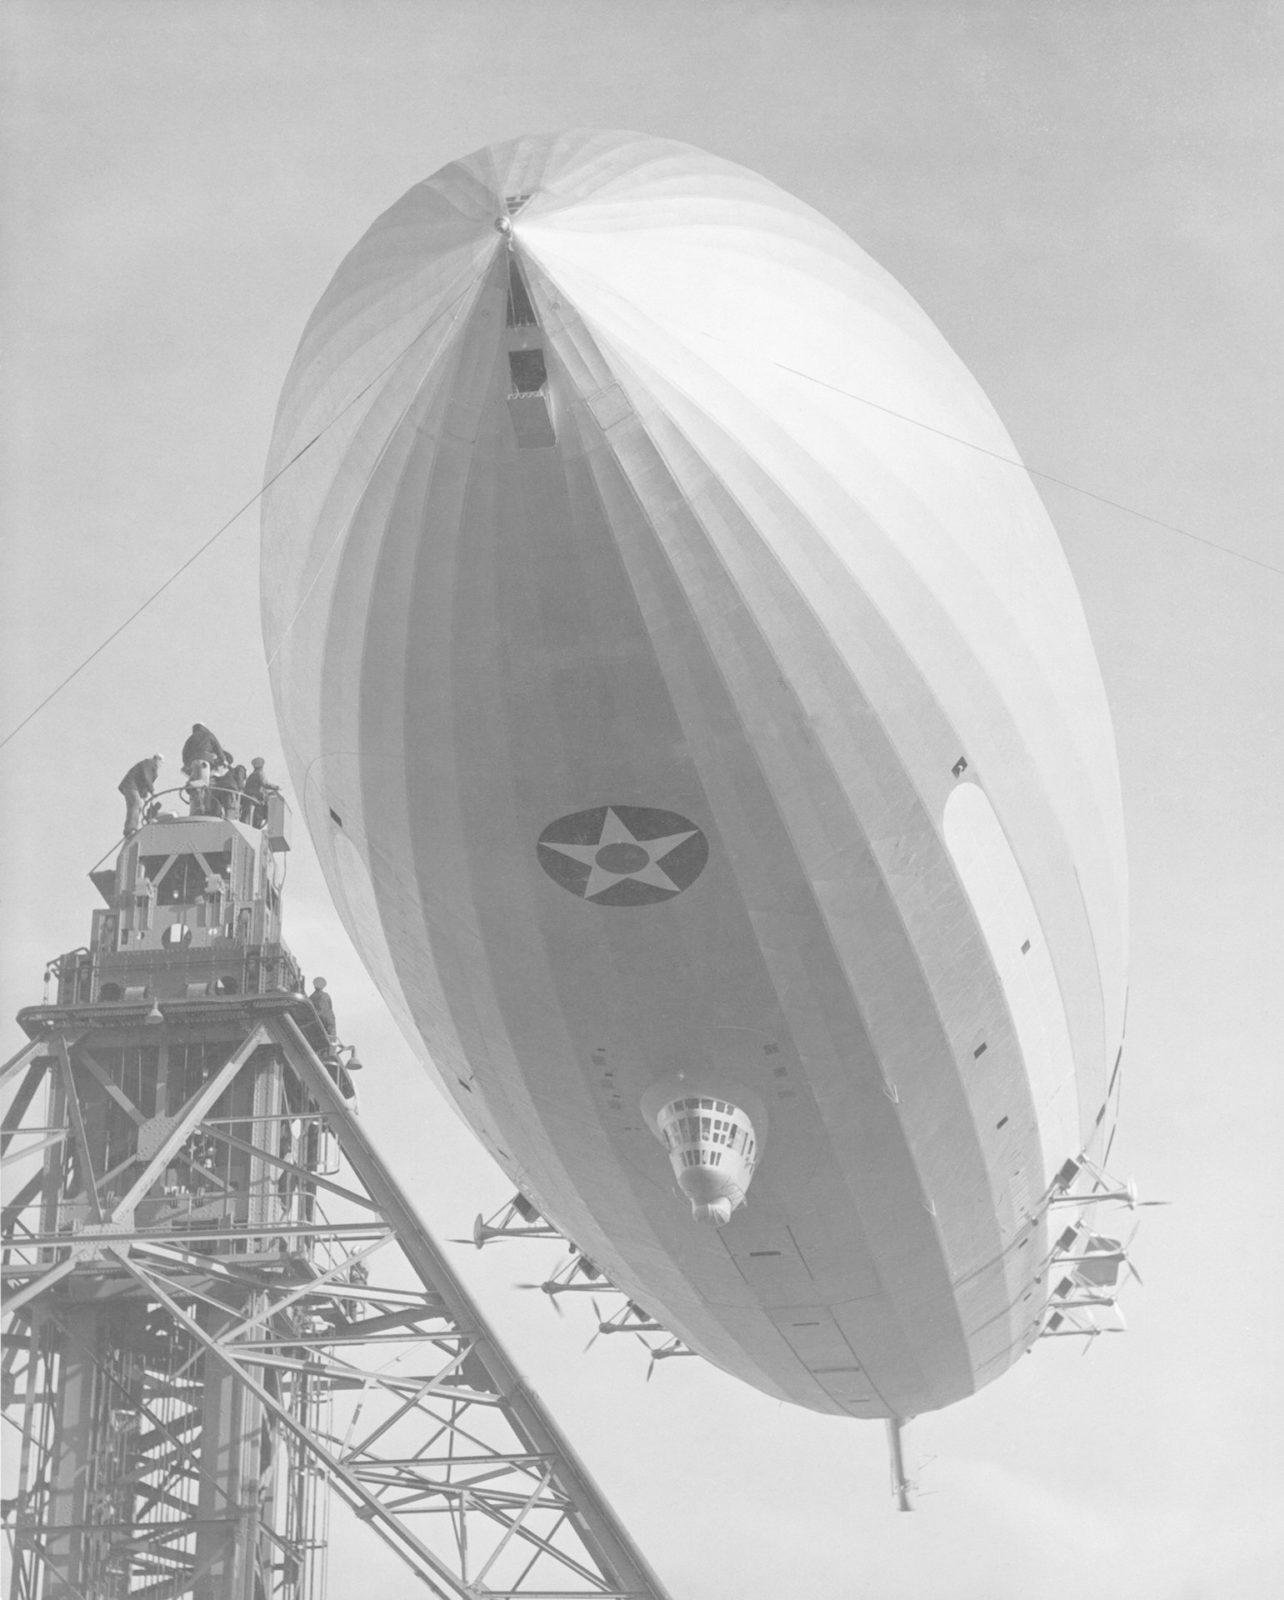 Navy USS Macon Mooring at south circle U.S. Naval Airstation Sunnyvale, Mt. View CA ARC-1934-A91-0261-21